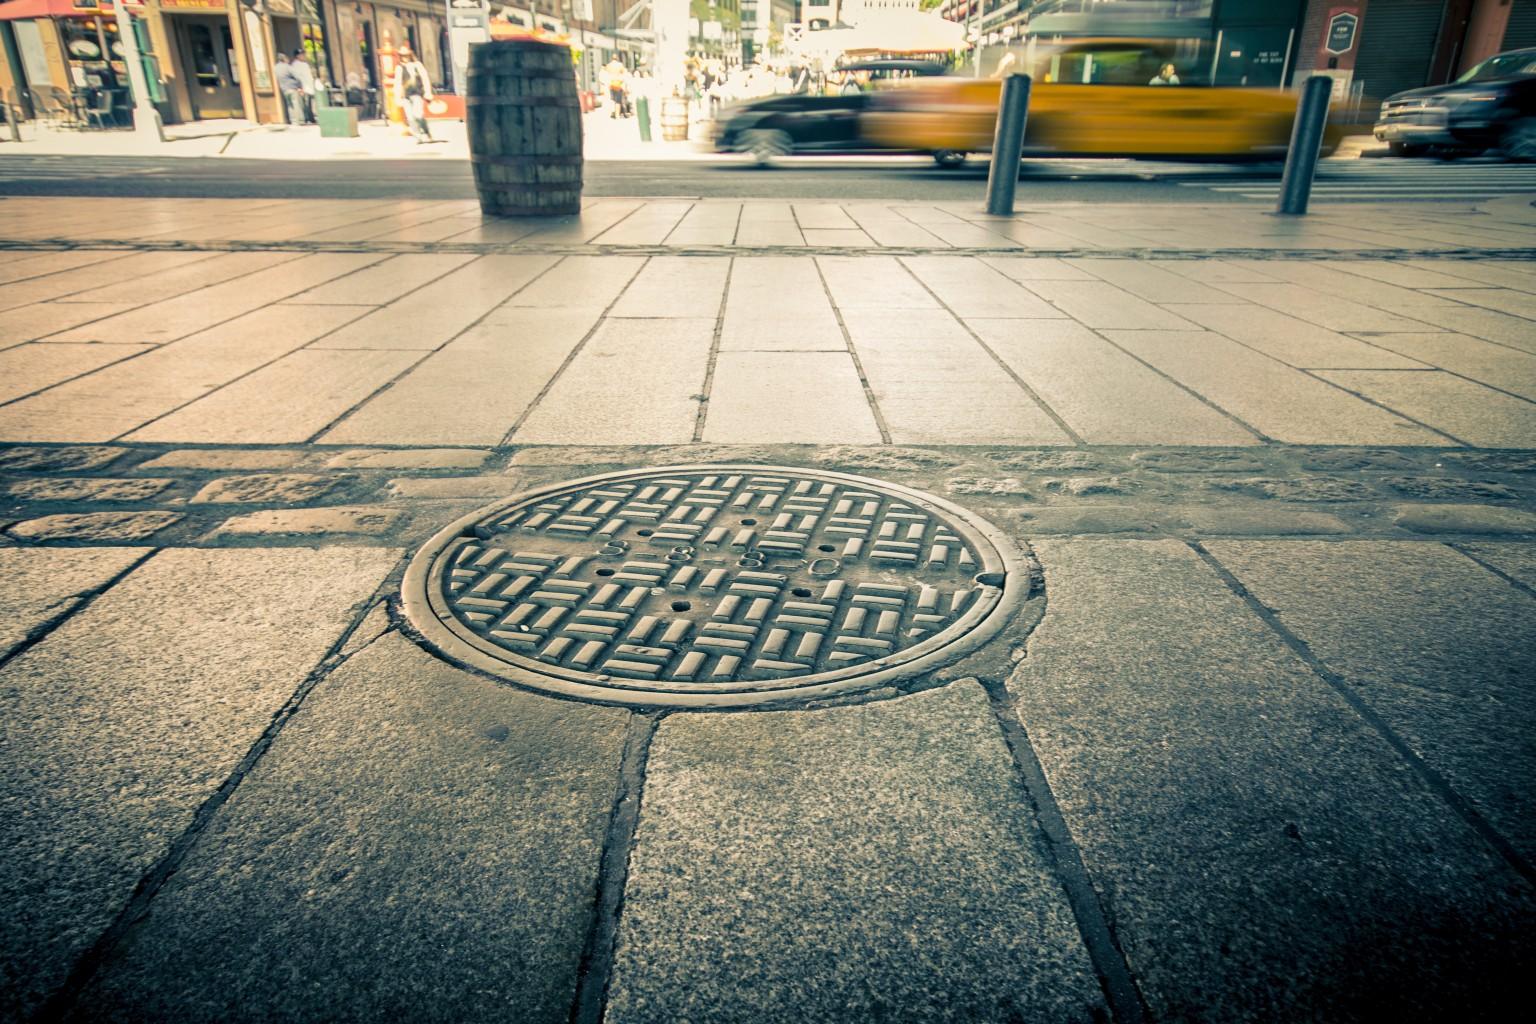 Manhole Switch